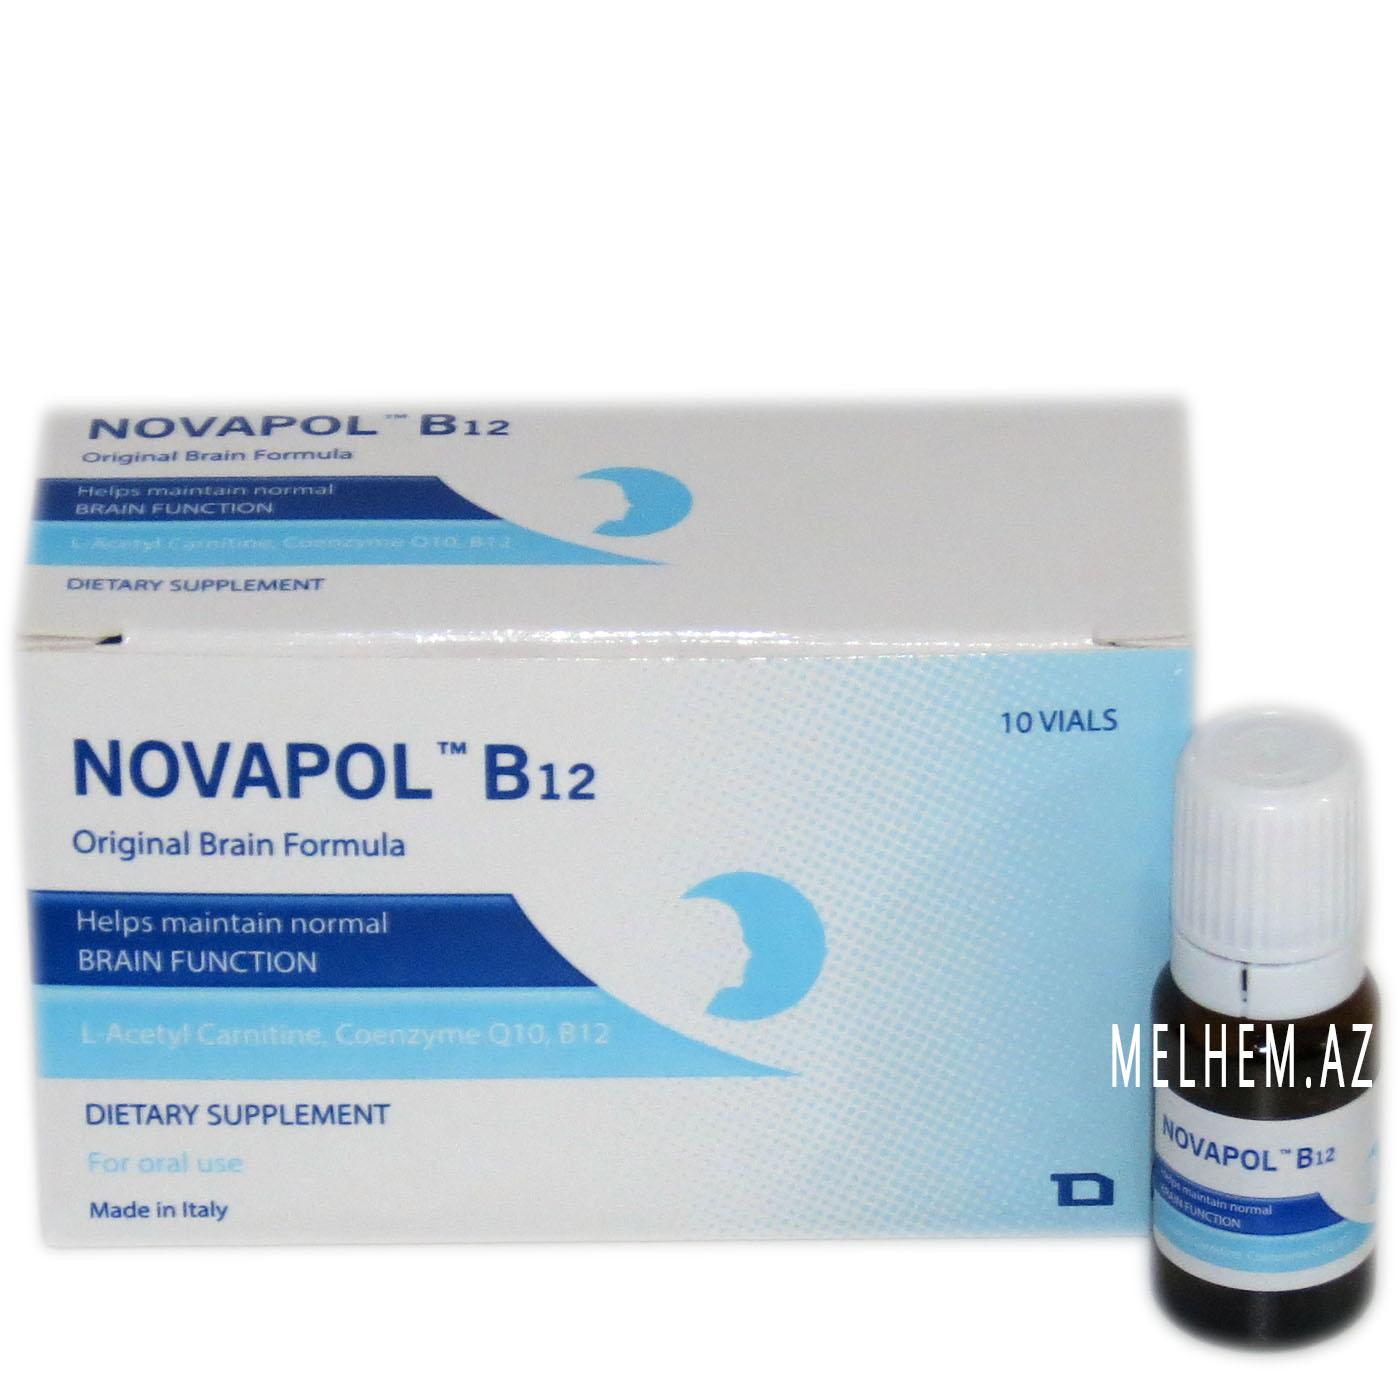 NOVAPOL B12